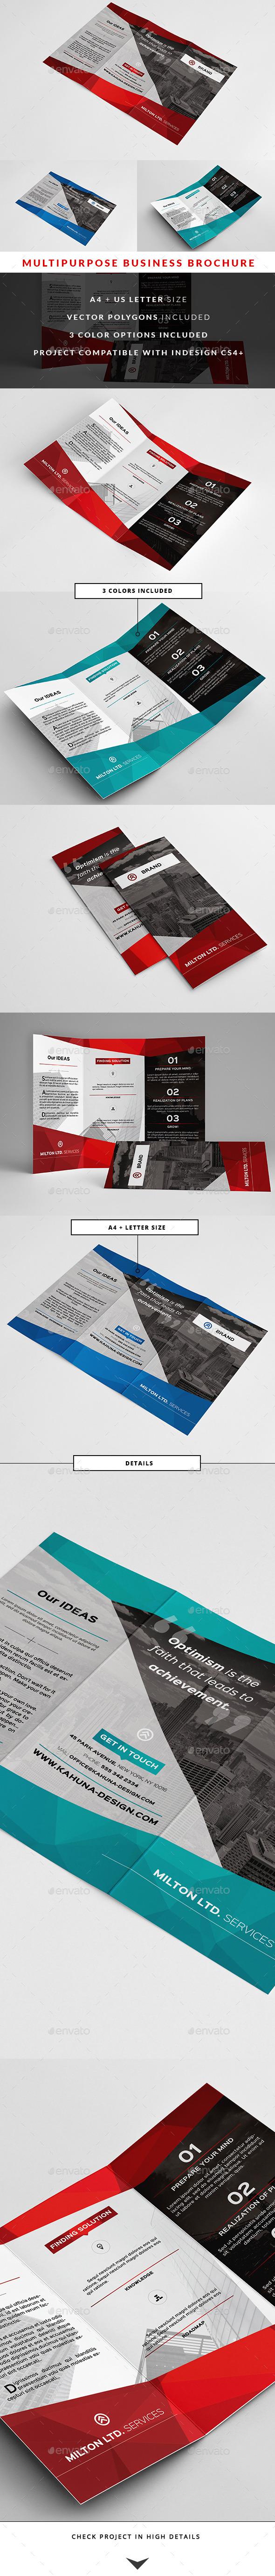 GraphicRiver Multipurpose Business Brochure 2 10567612